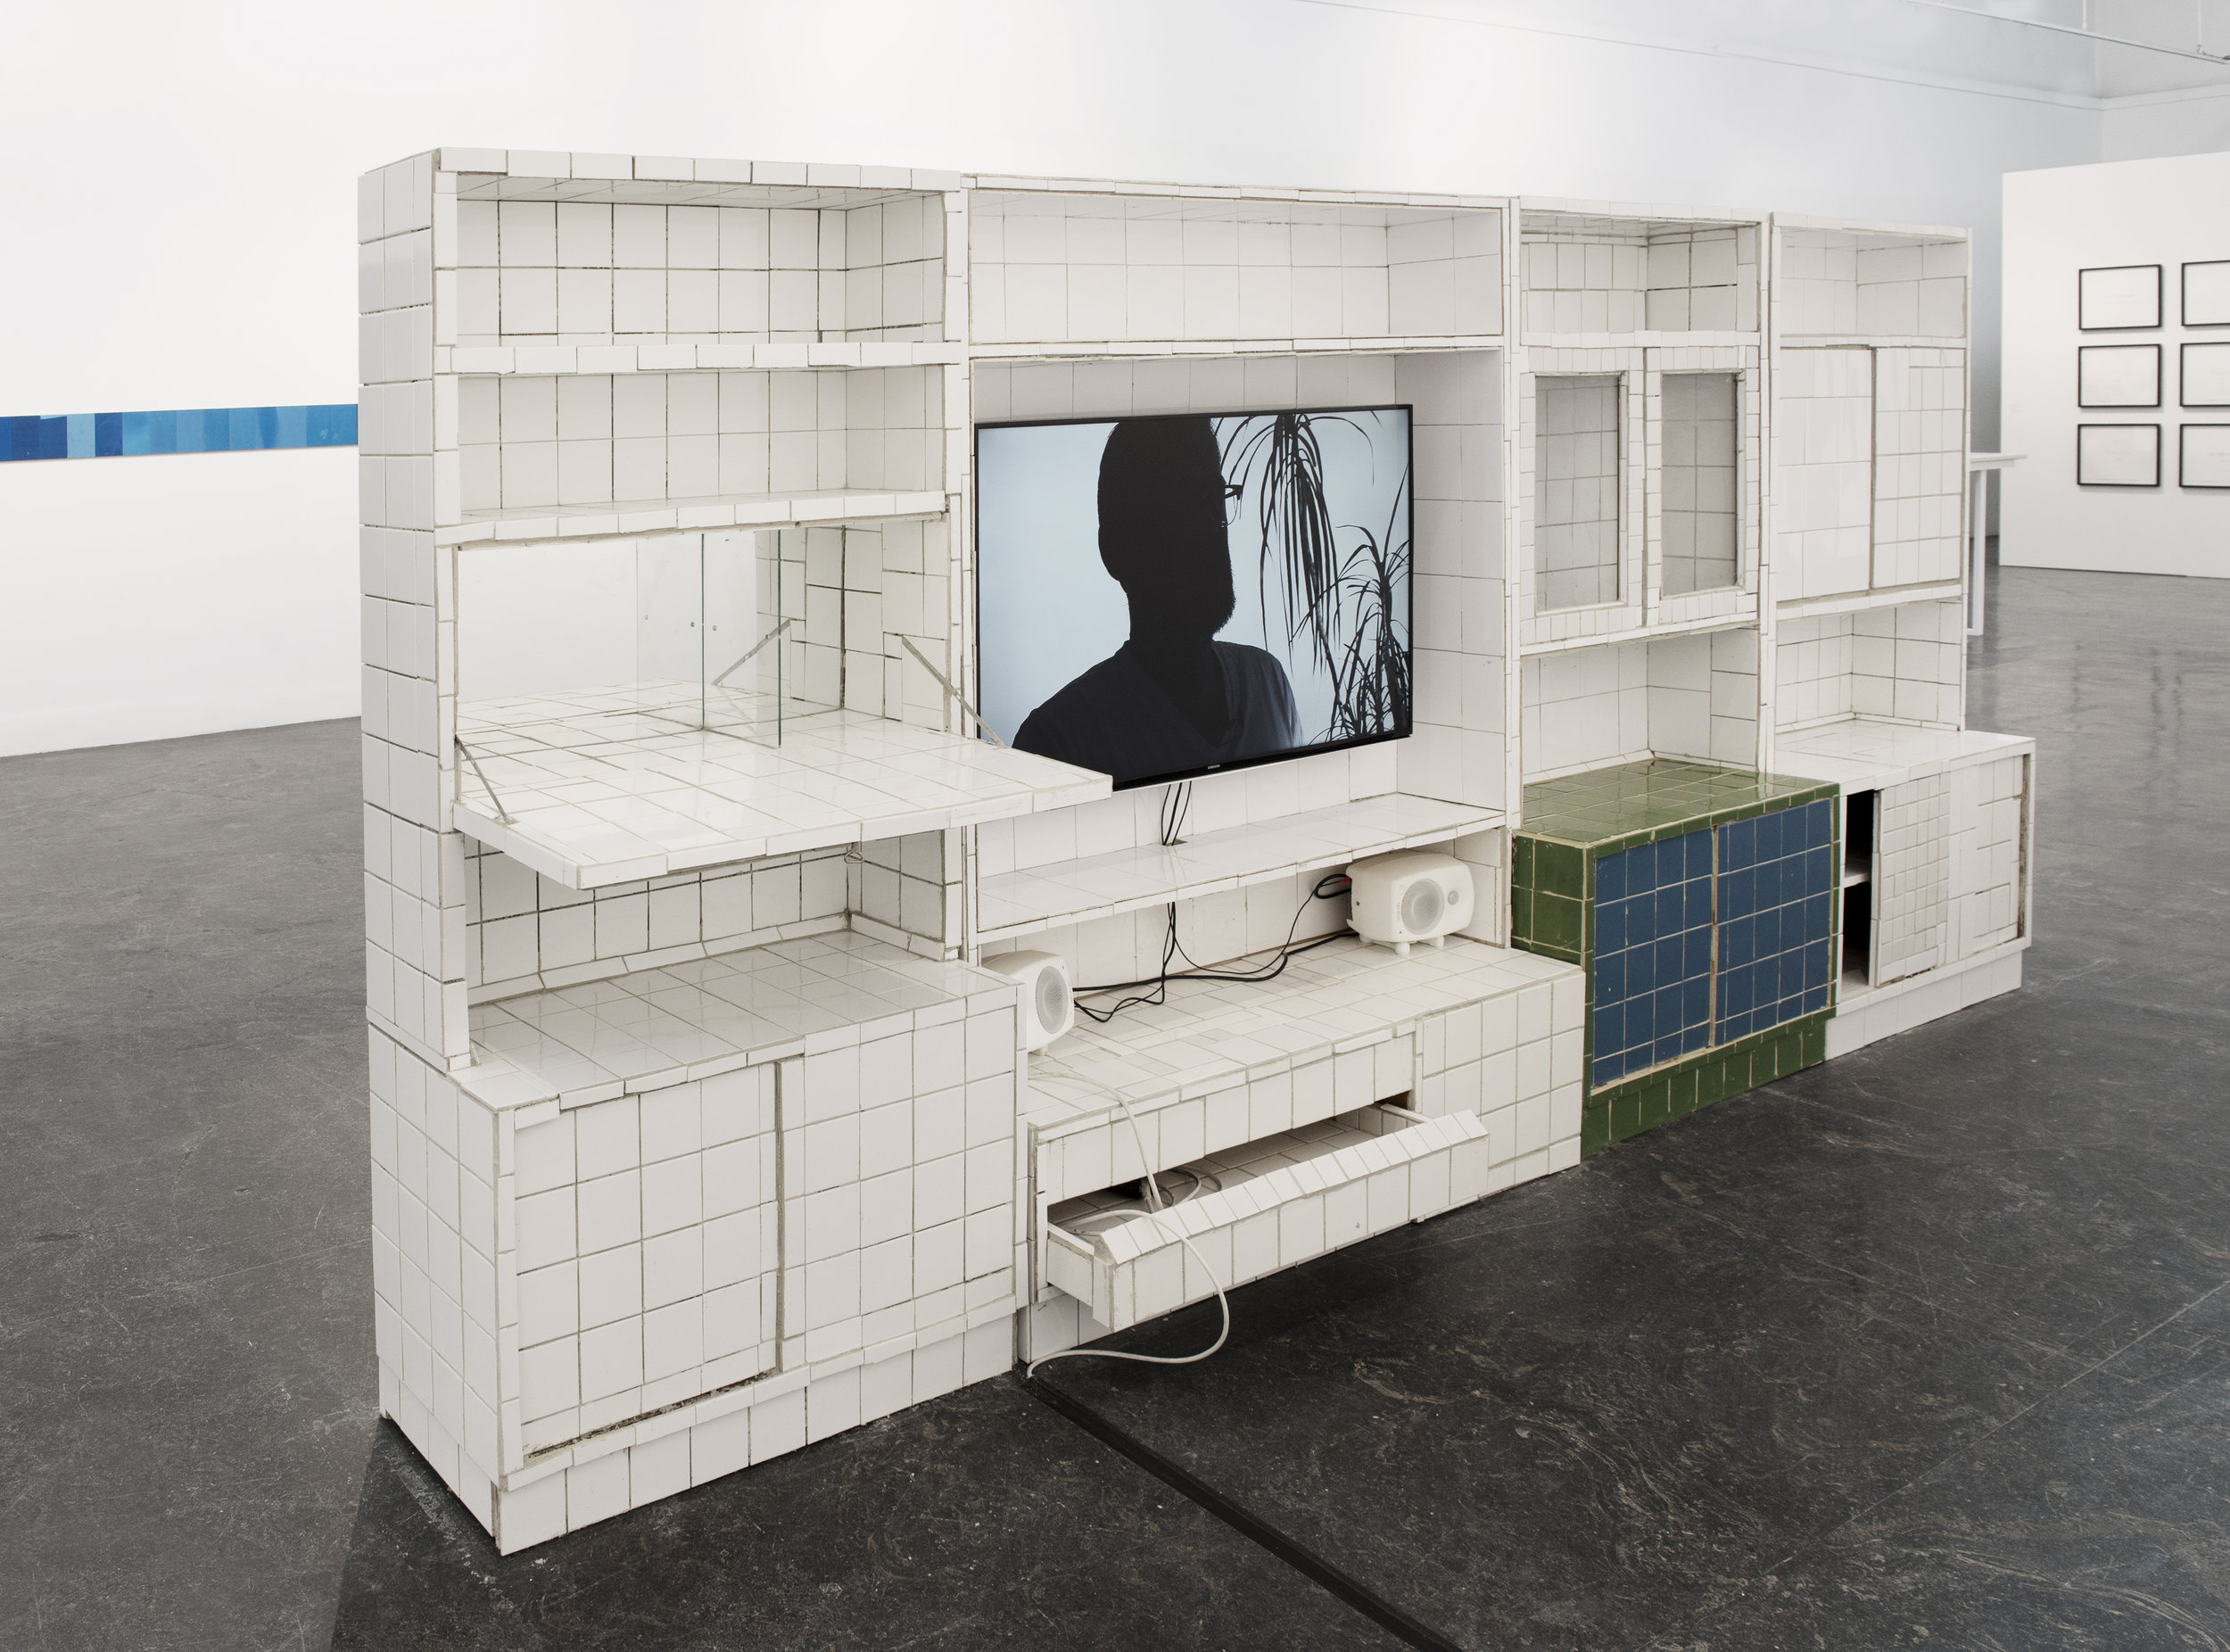 Installation from Europe is Balding , 2016, Matias Faldbakken. Photo by Christina Leithe H.